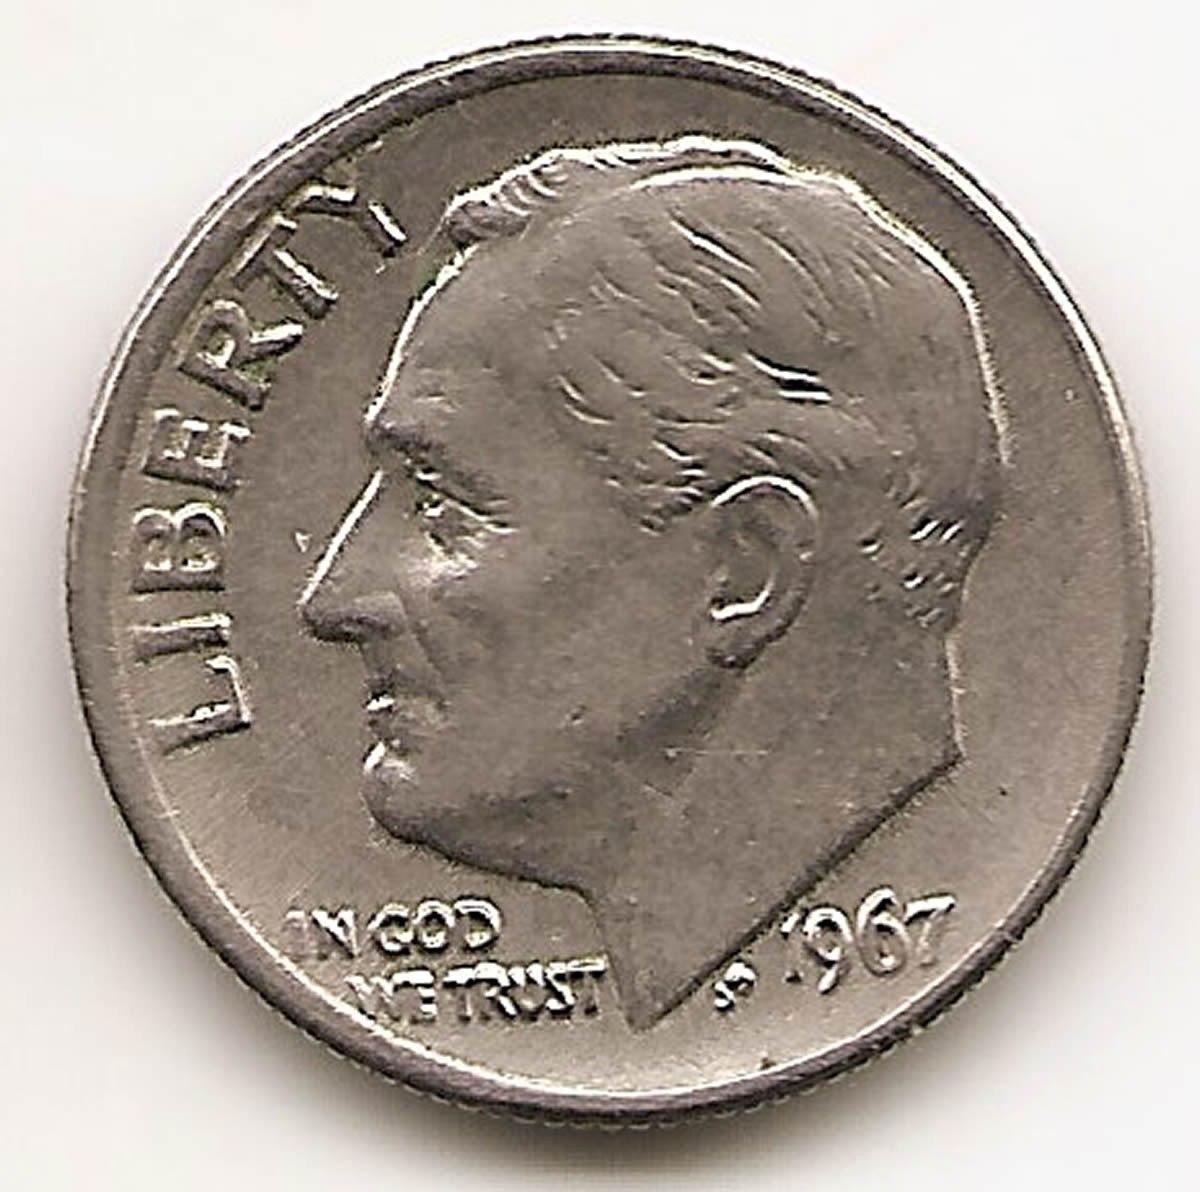 Moneda de Diez Centavos Valor de Moneda de Diez